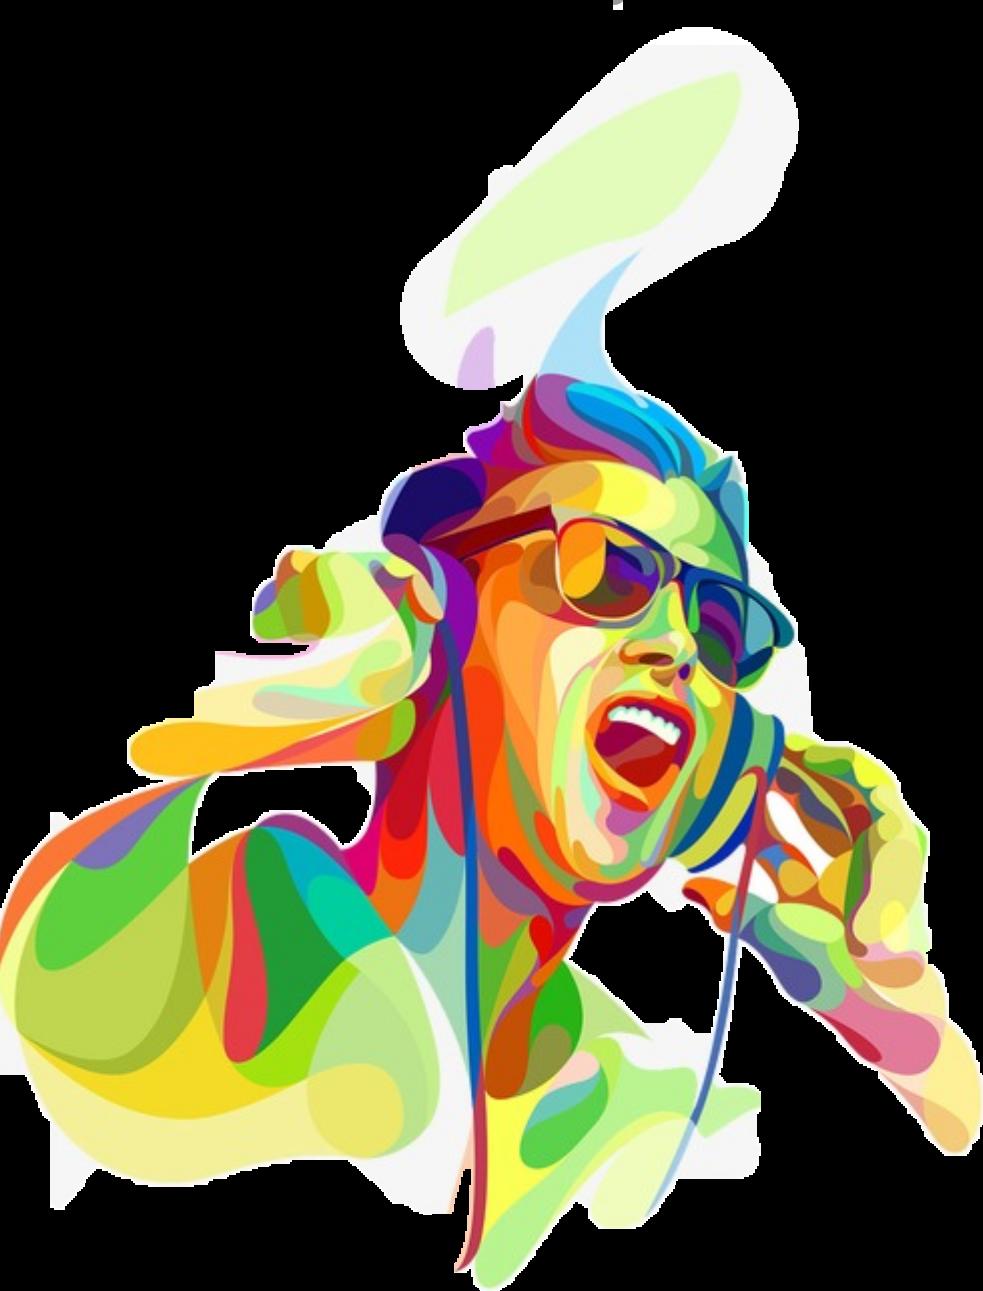 Dj clipart pop music. Guy headphones sound yell